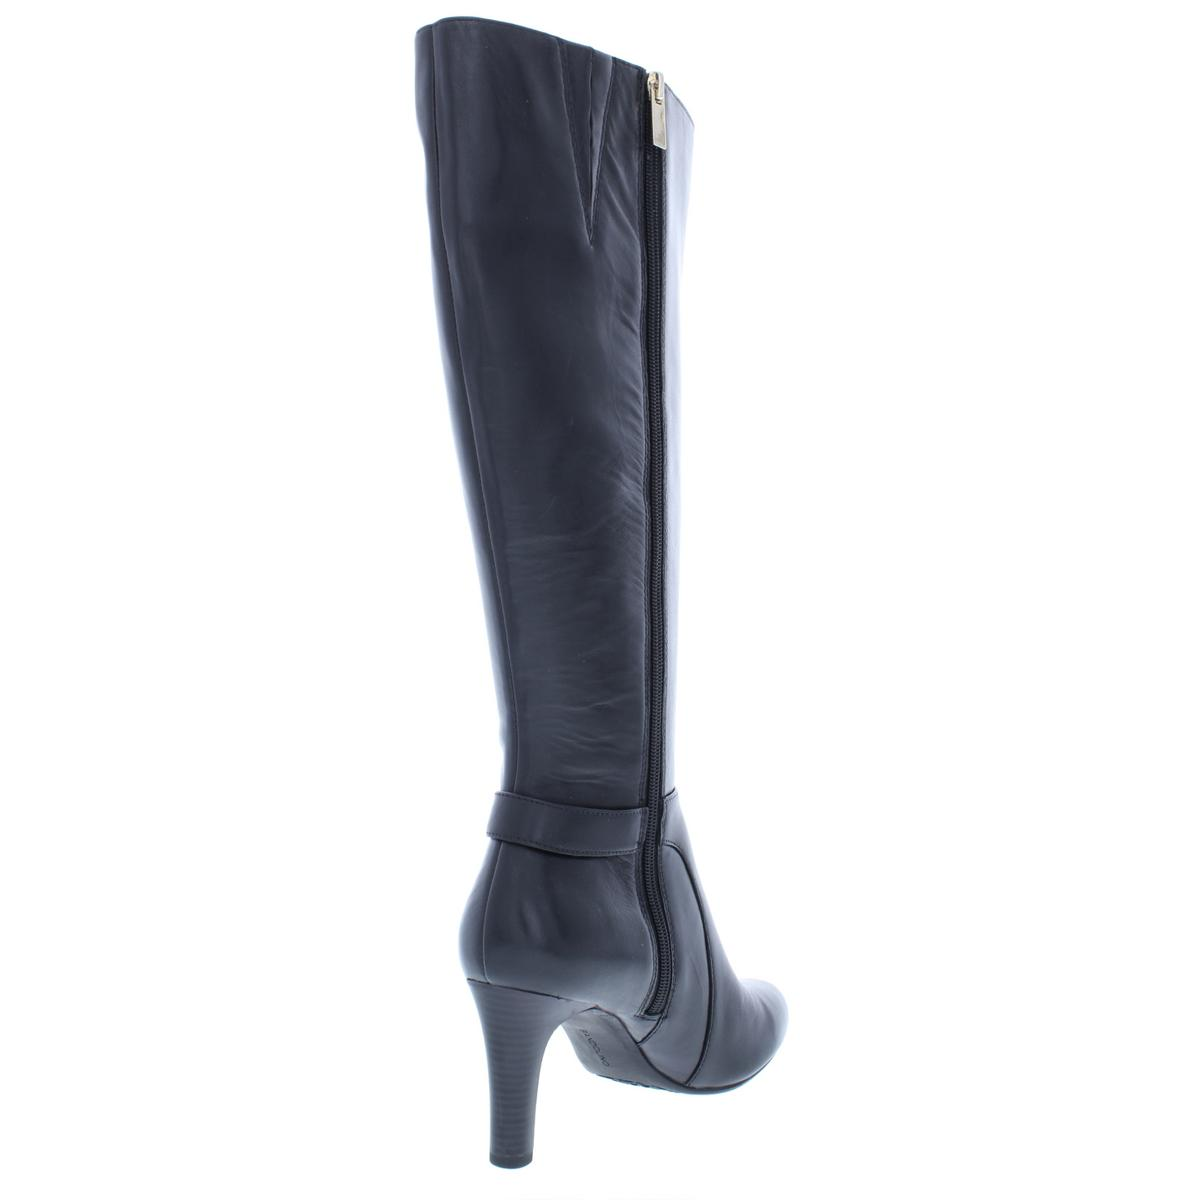 Bandolino Damenschuhe Lamari Wide Calf Over The Knee Dress Dress Dress Stiefel Schuhes f36d44